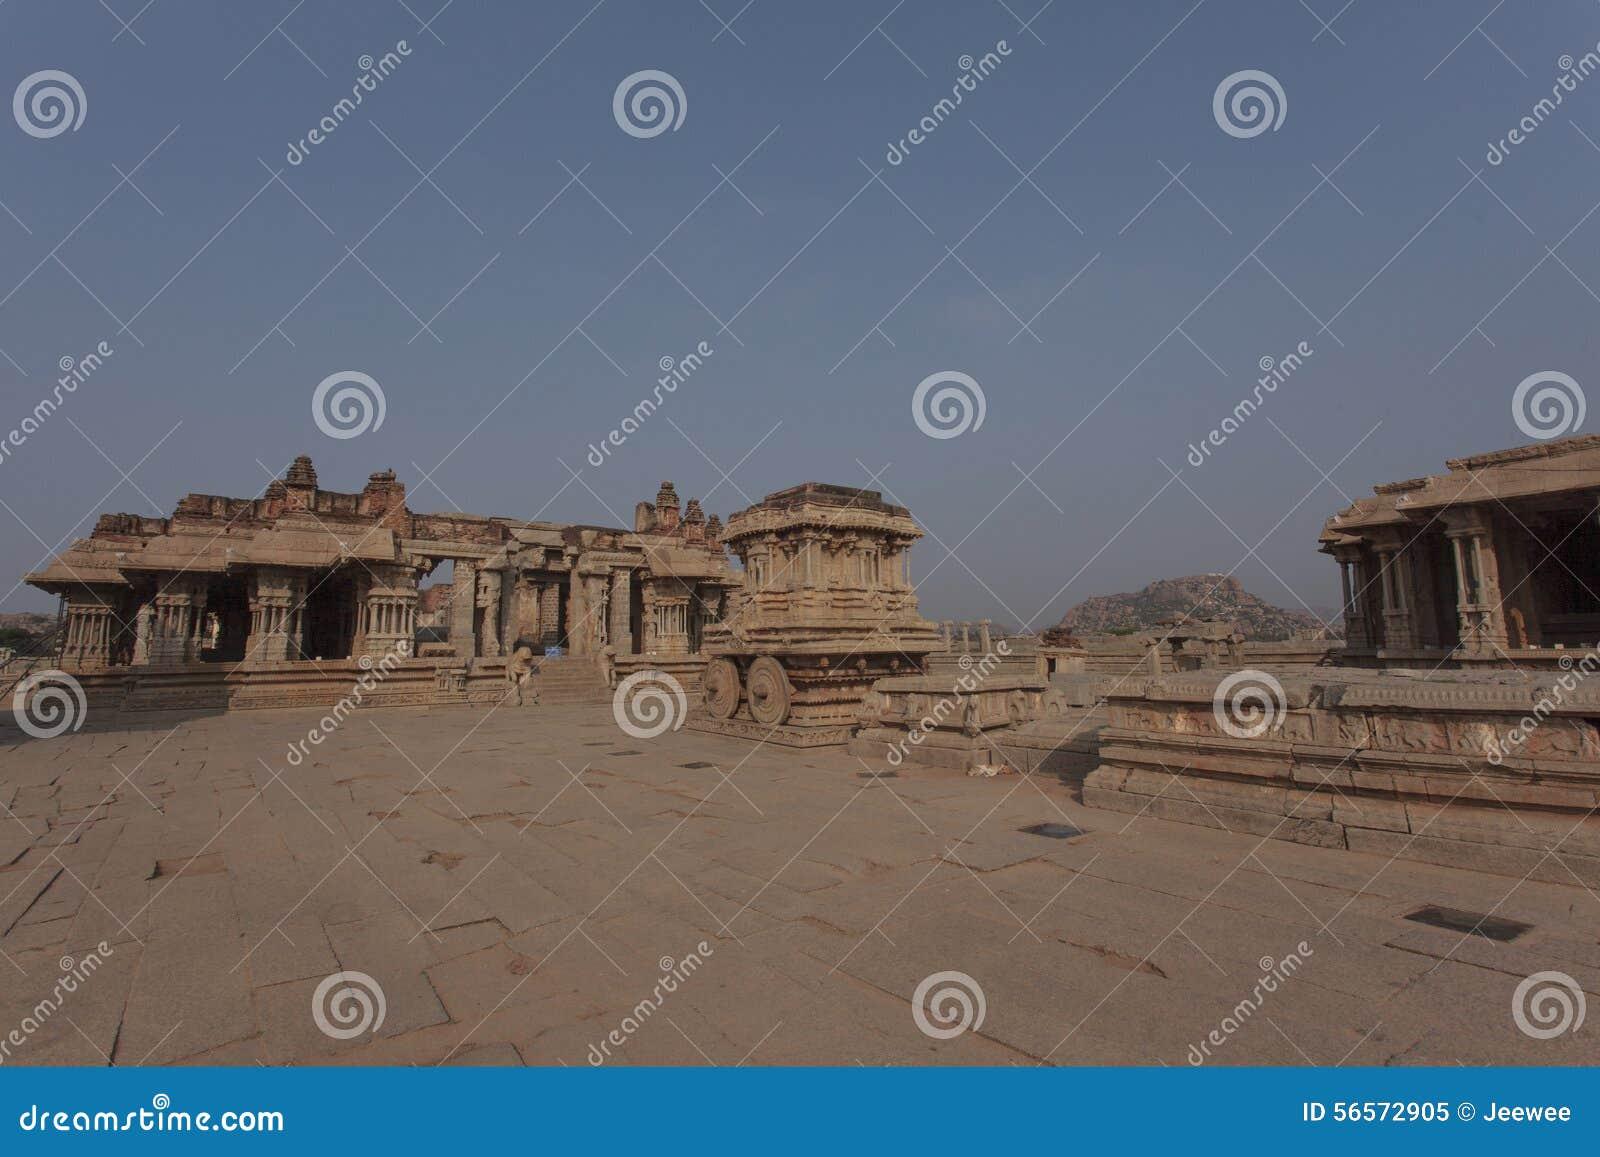 Download Μέσα στον ινδό ναό Vittala στην αρχαία περιοχή Hampi, Karnataka, Ινδία Στοκ Εικόνα - εικόνα από διακοσμημένος, θρησκεία: 56572905